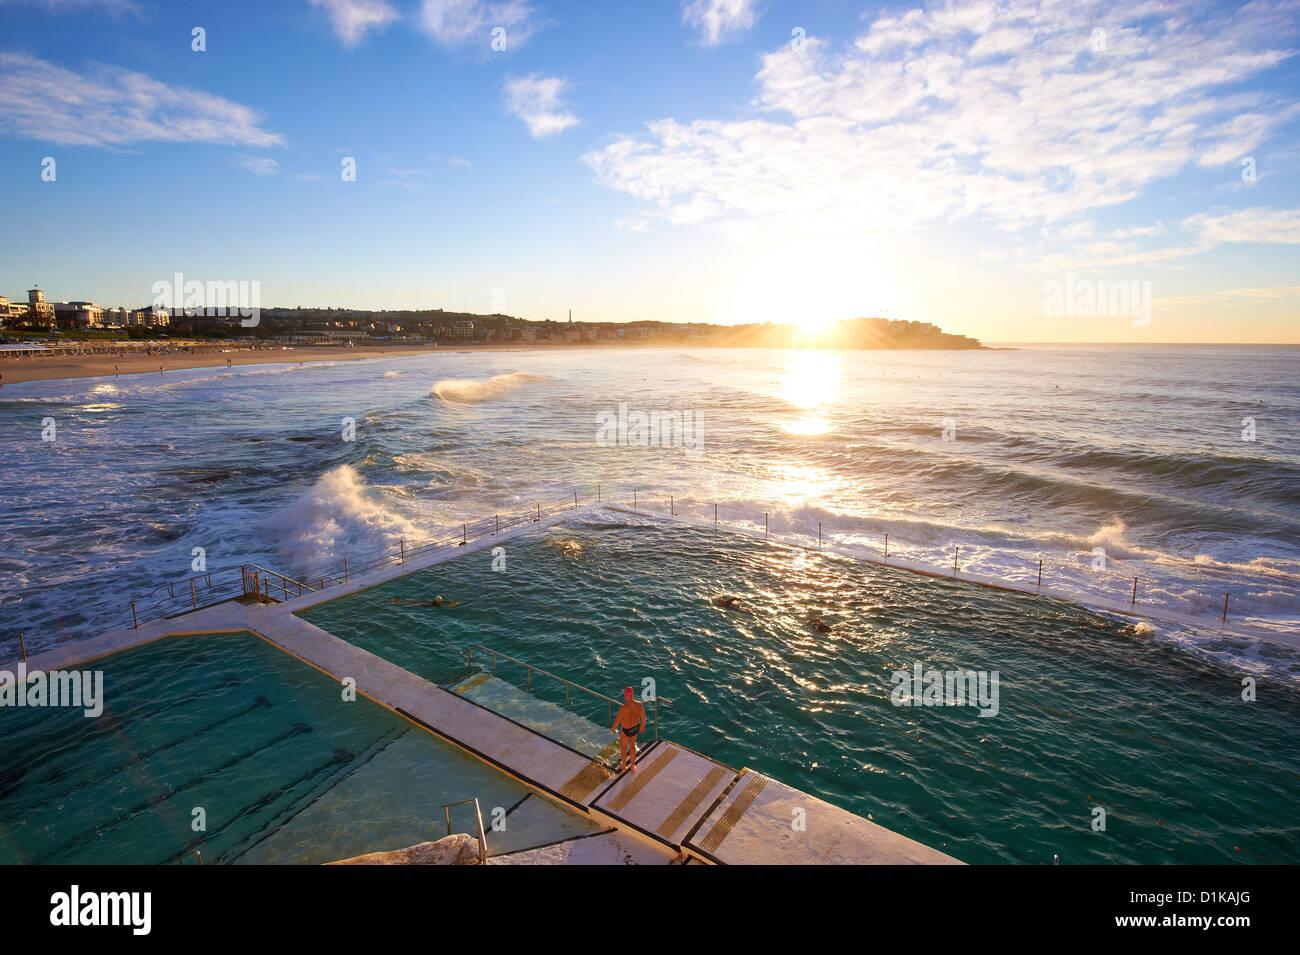 Bondi Icebergs, Sydney New South Wales Austrália Imagens de Stock